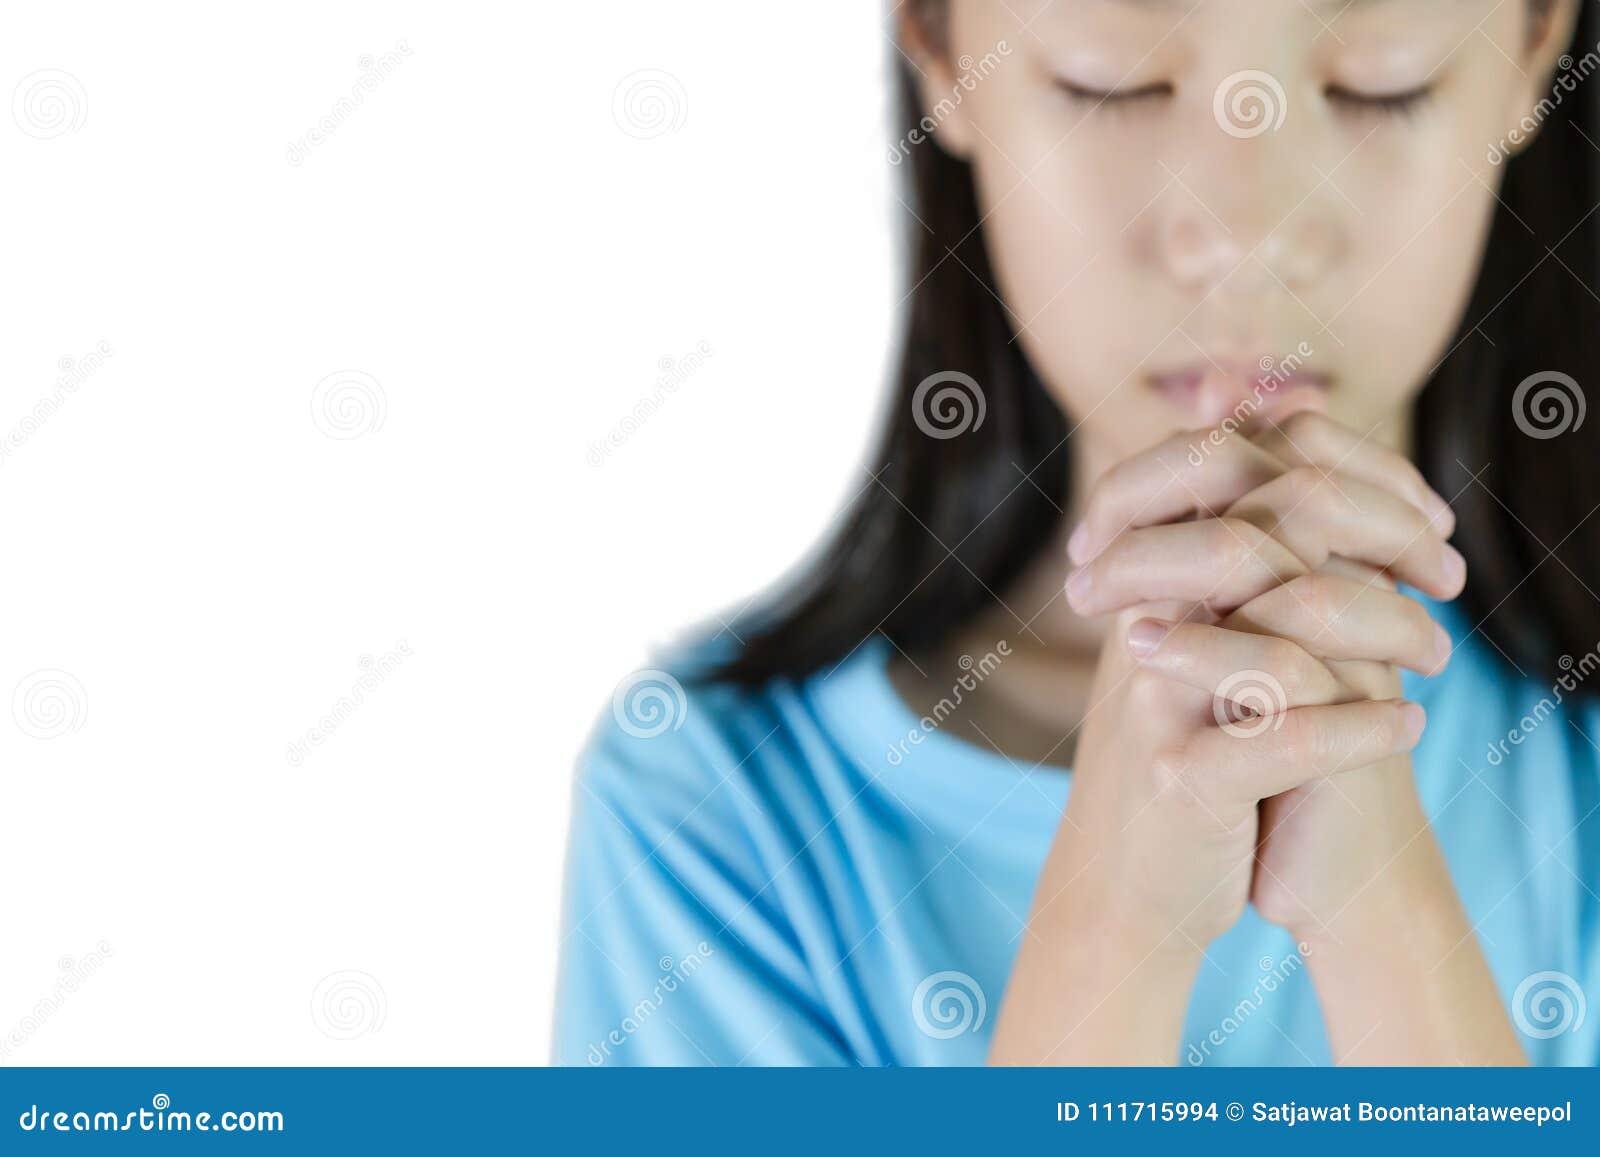 Asian prayer eating images 747